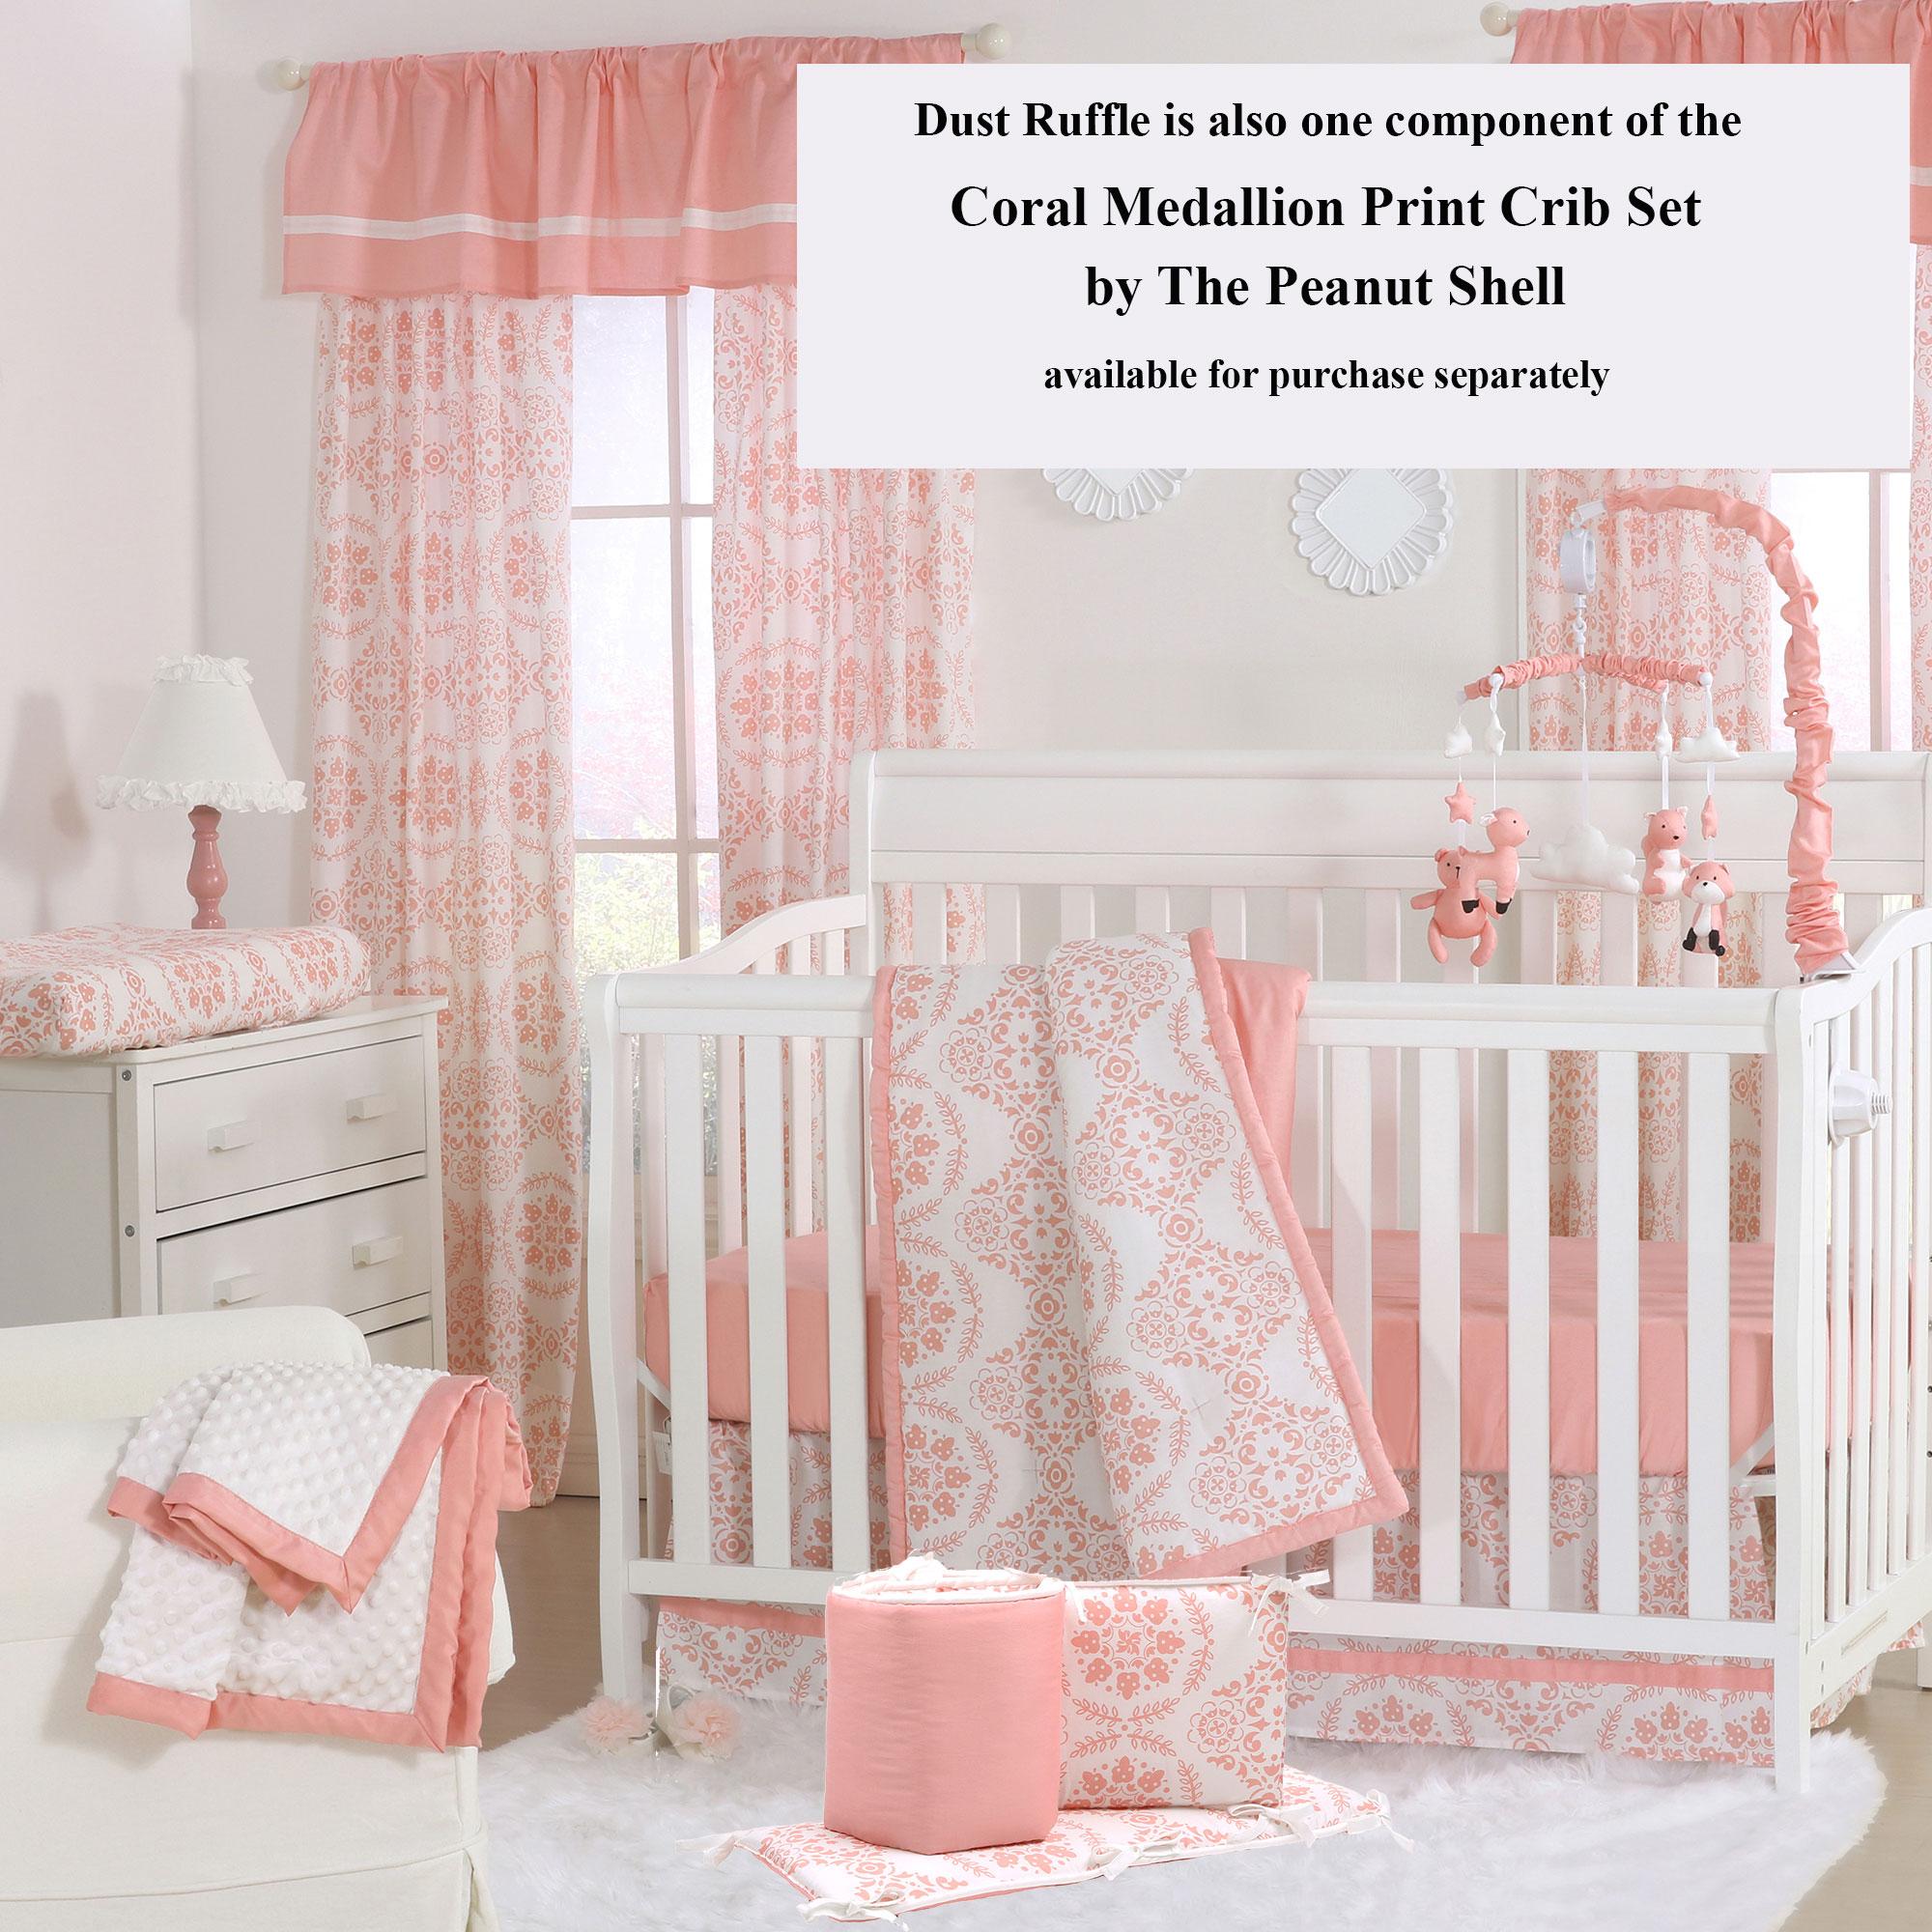 co sheets for garanimals ruffle crib aetherair cribs asli dust